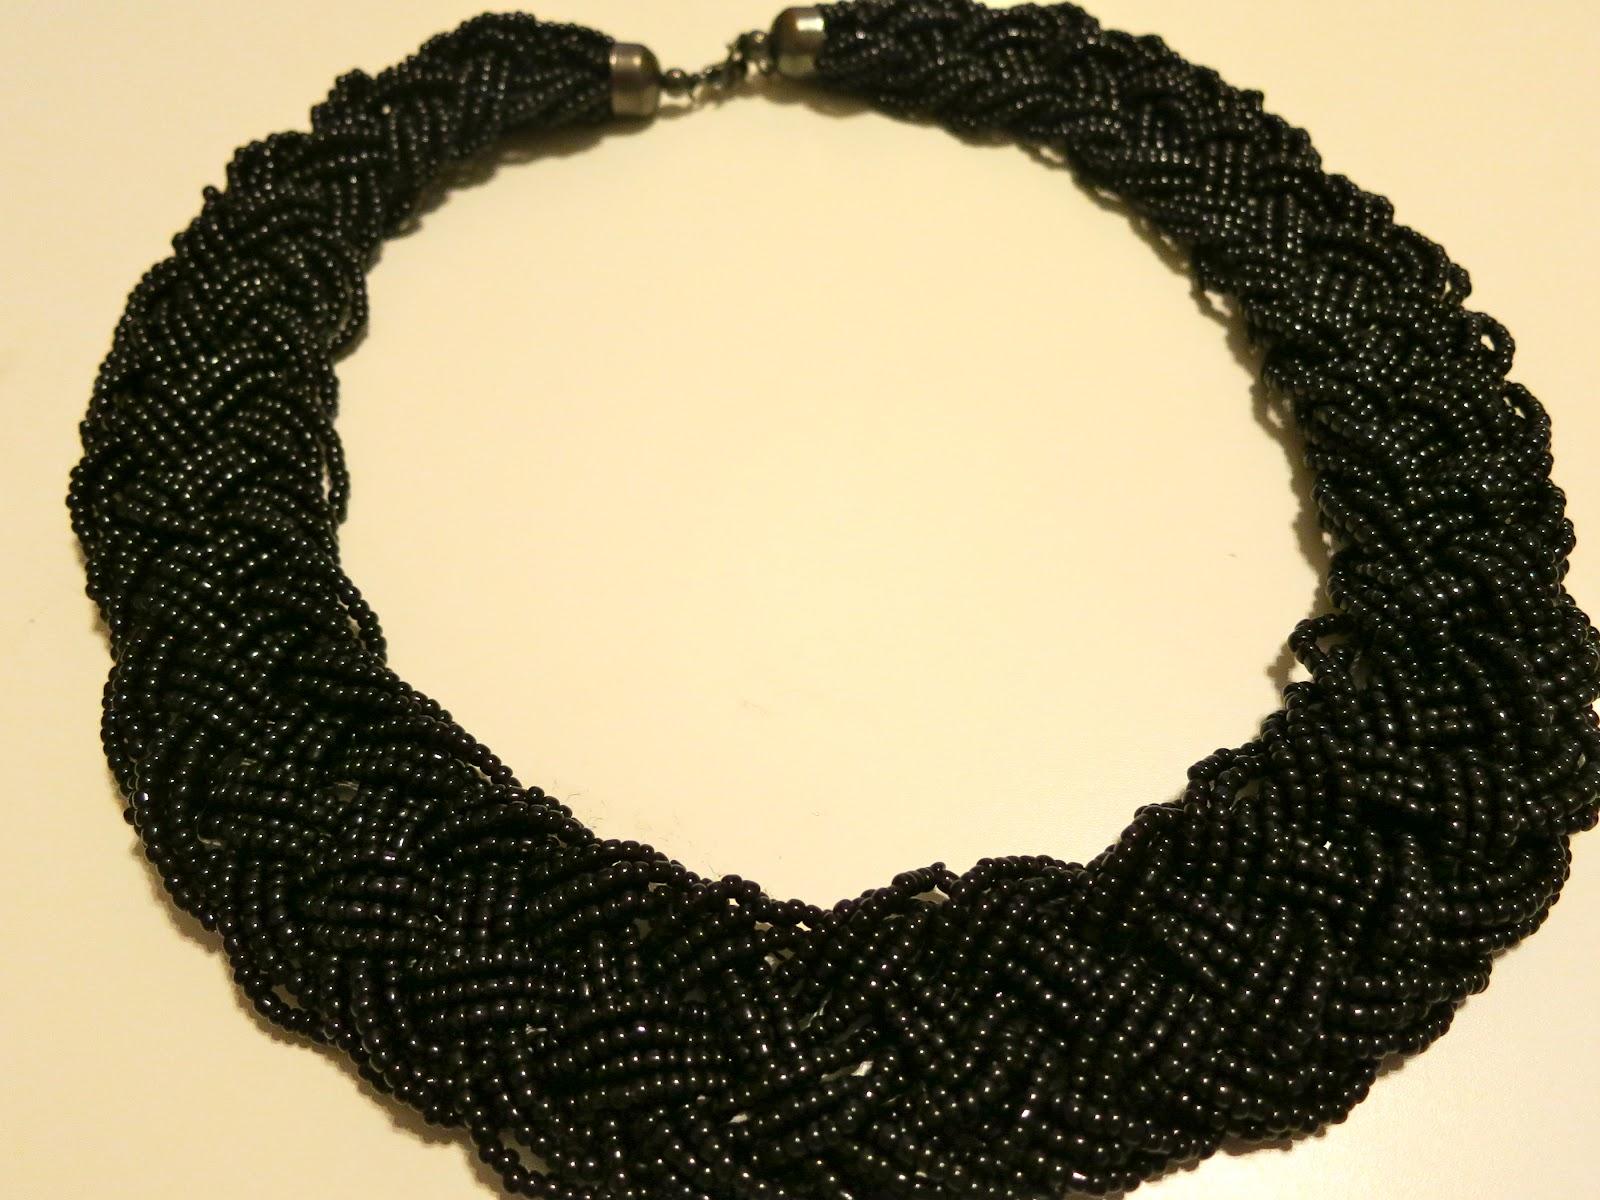 Dianne Creates DIY Gold Bib Necklace - Diy braided necklace